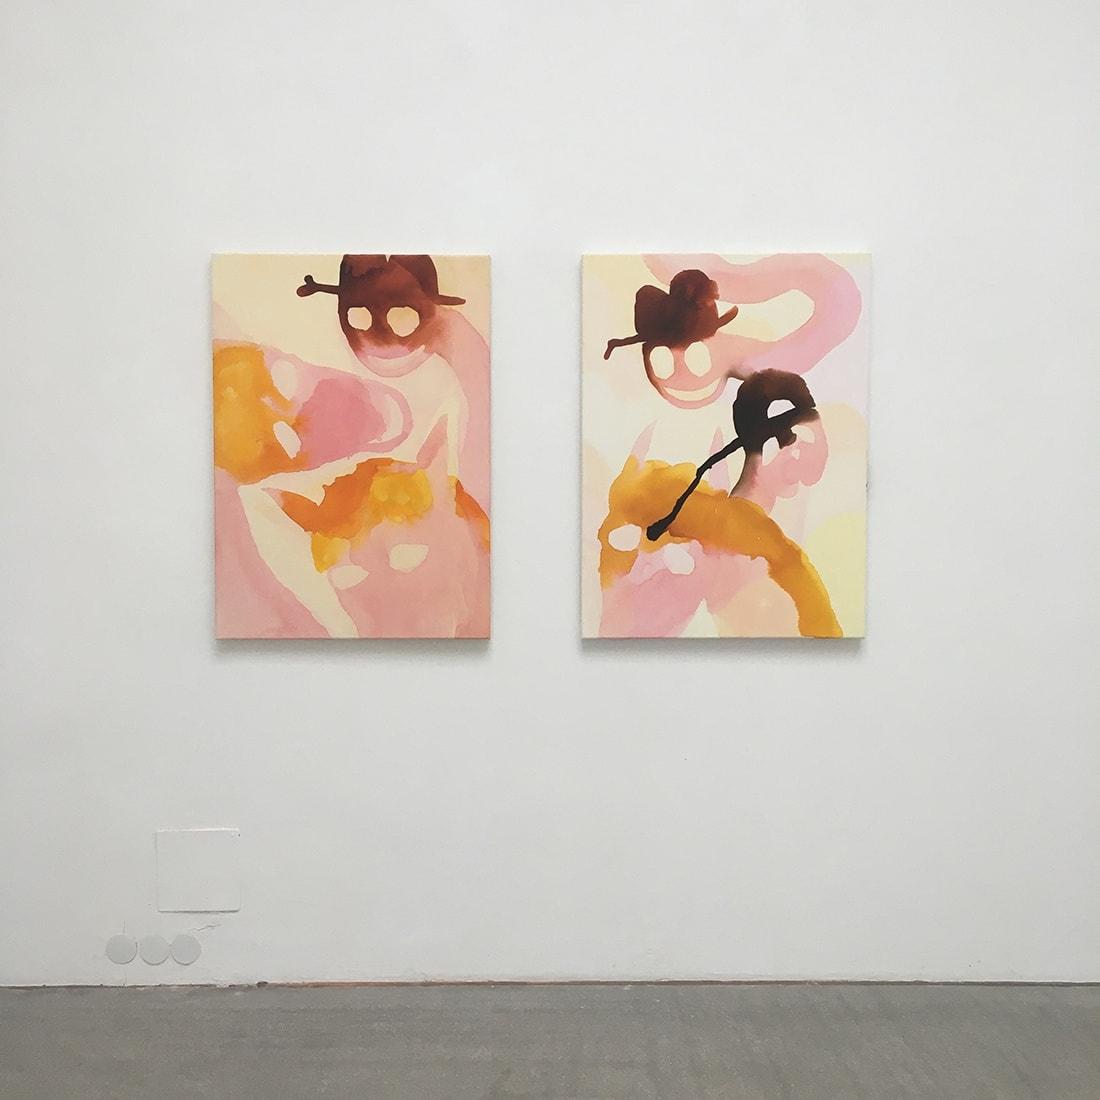 sarah bogner pink smoking horse painting at galerie raum mit licht